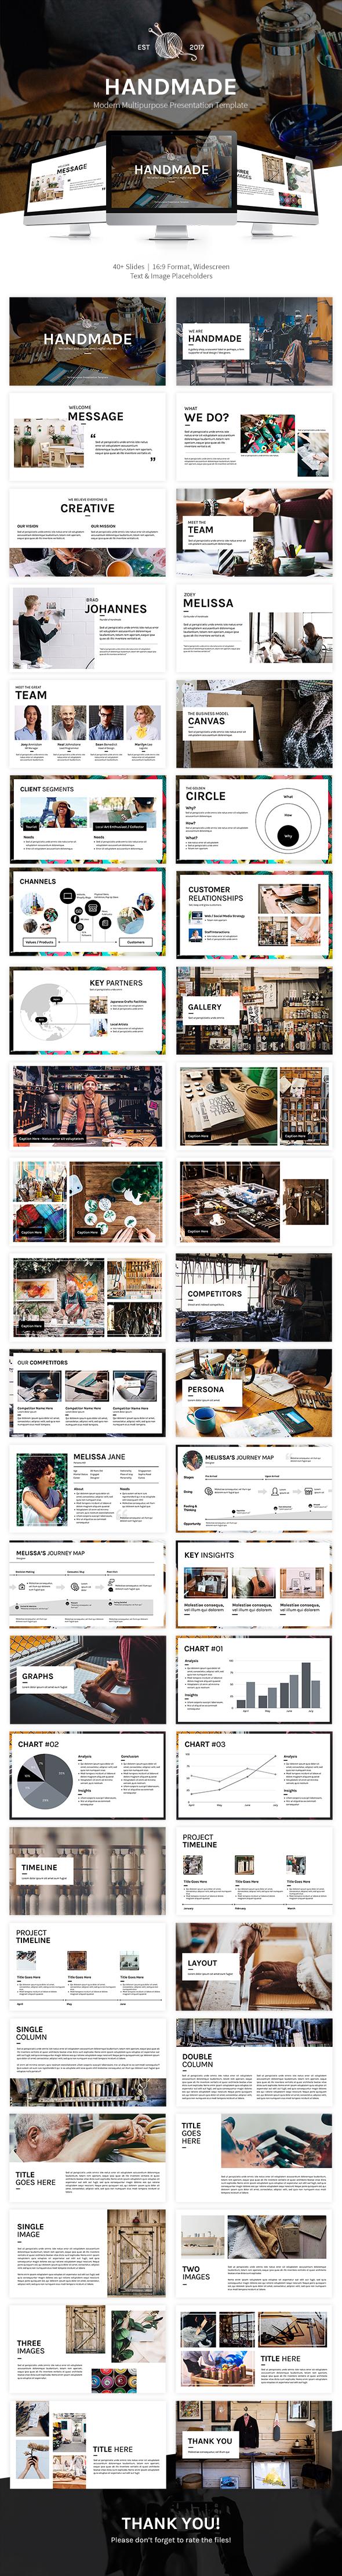 GraphicRiver Handmade Multipurpose Google Slide Template 21047472